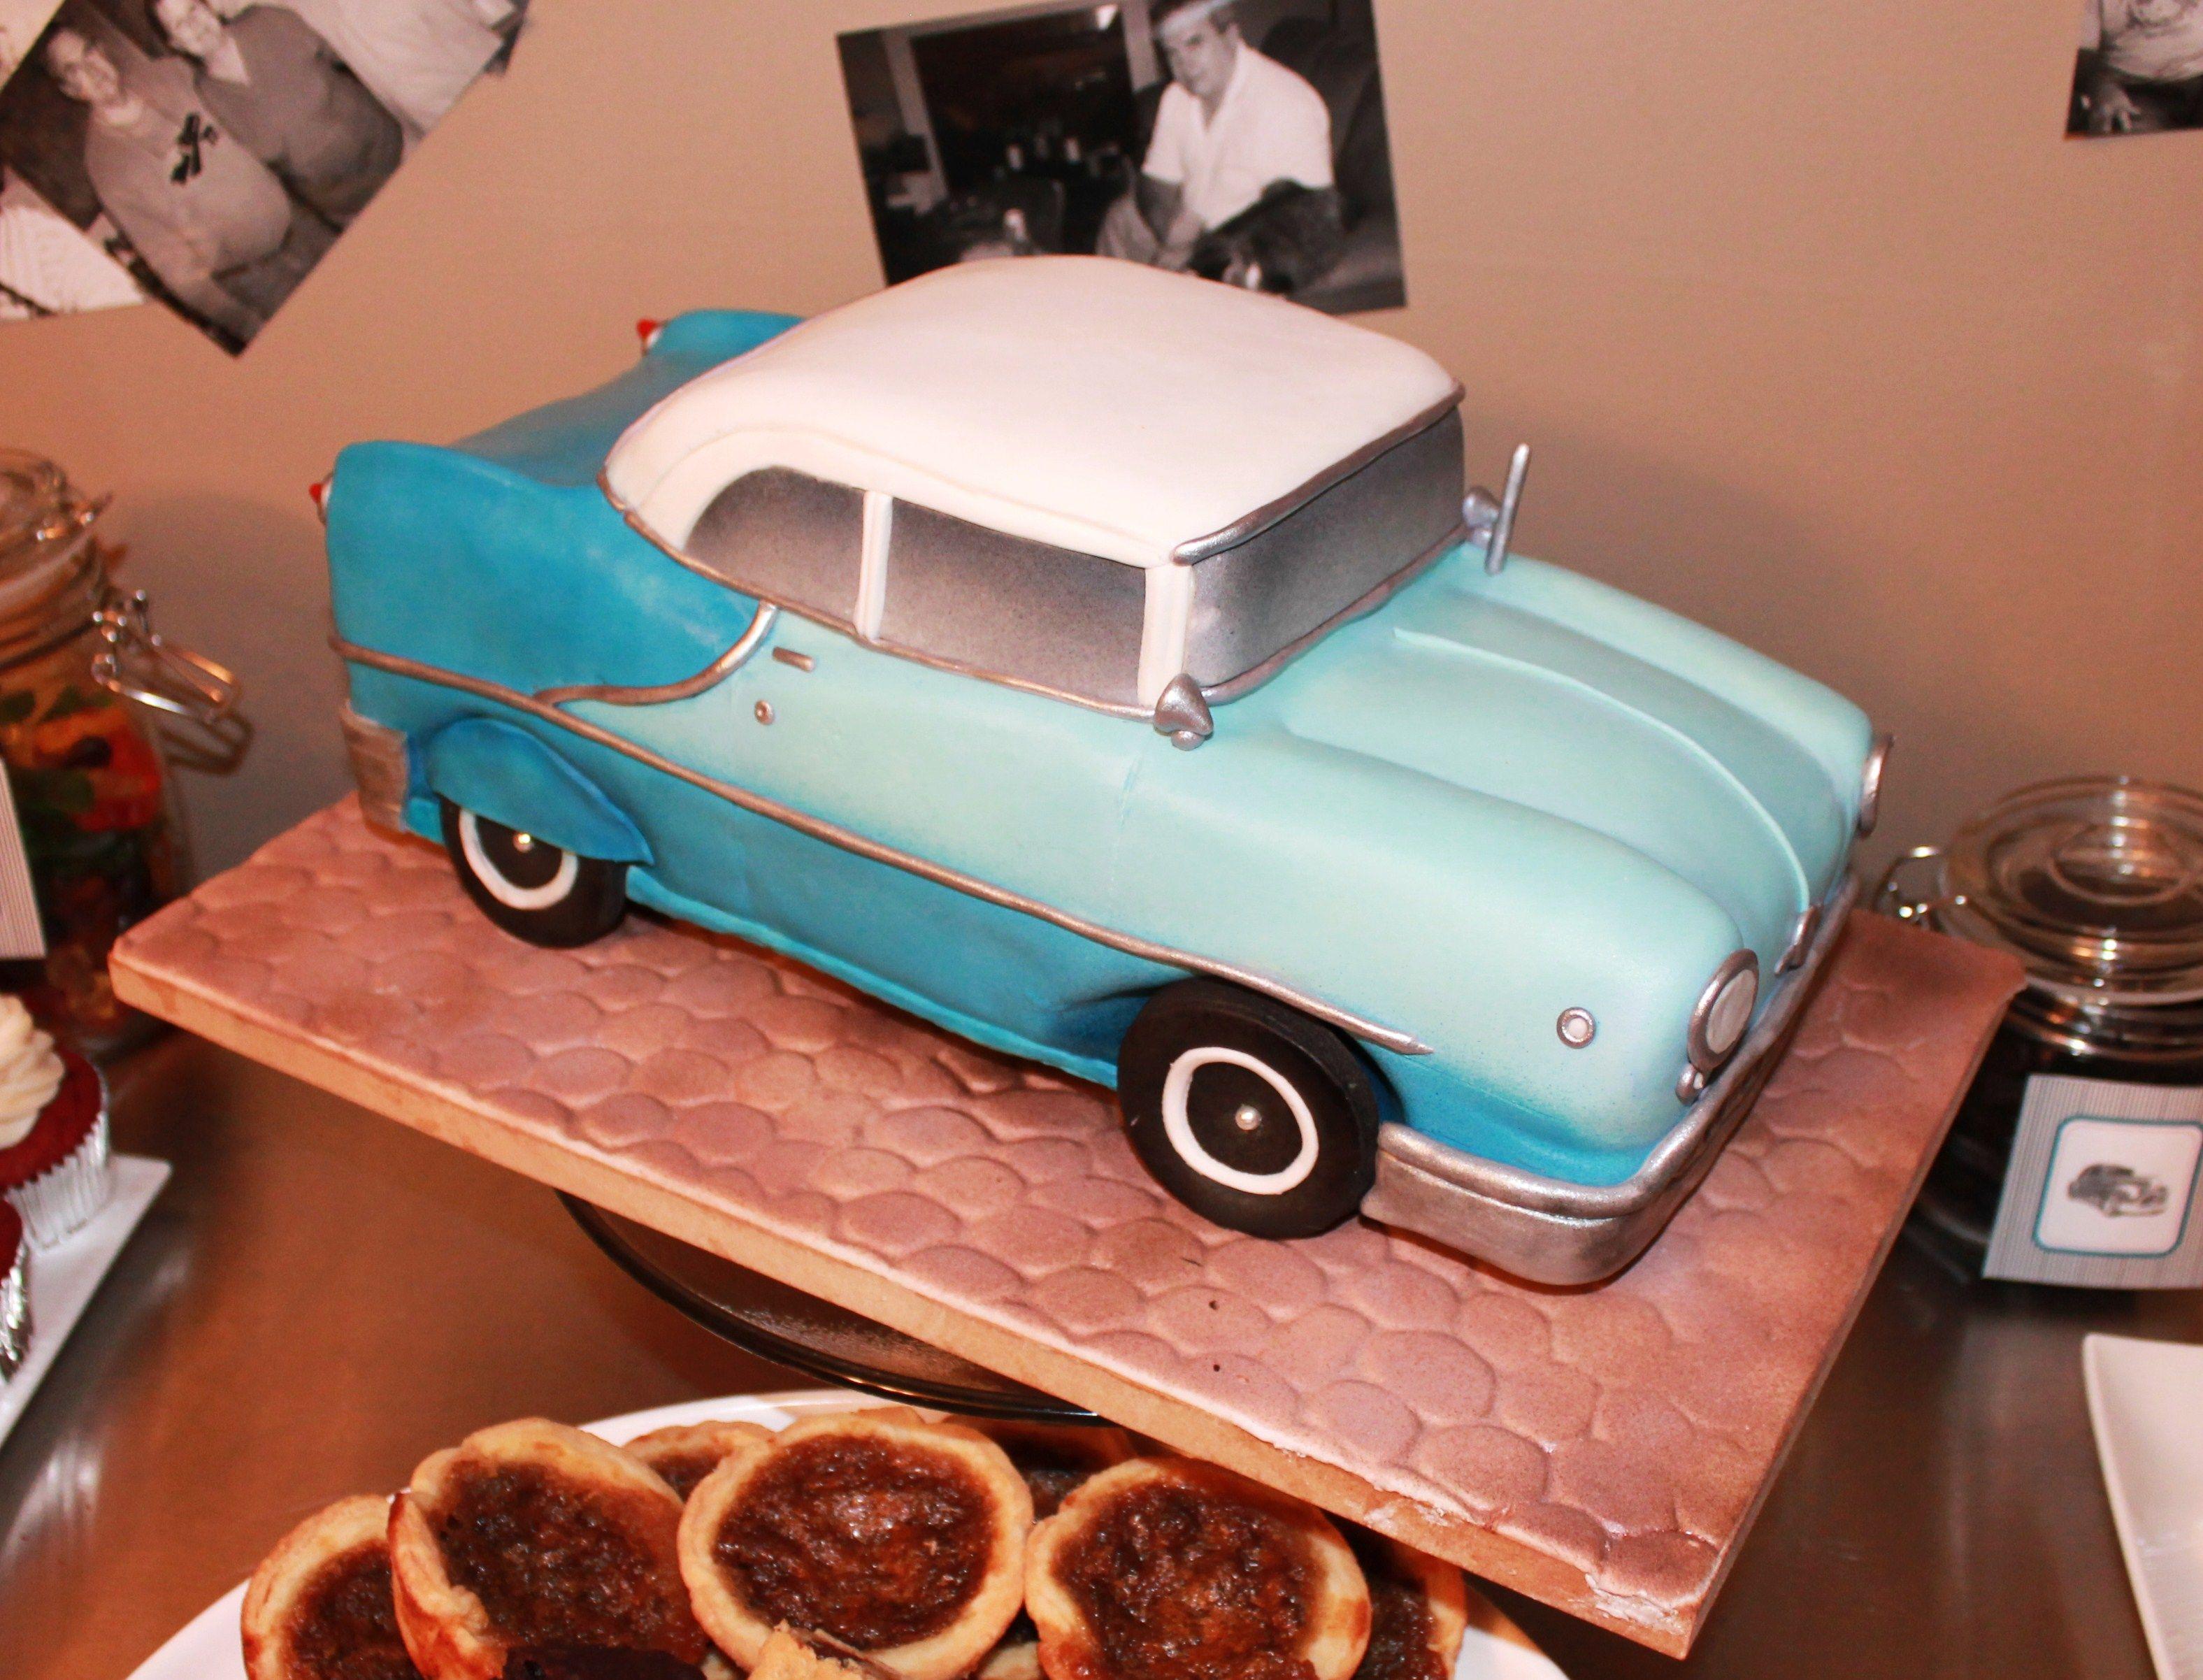 Replica Vintage Car Cake Www Facebook Com Sugspicecakes